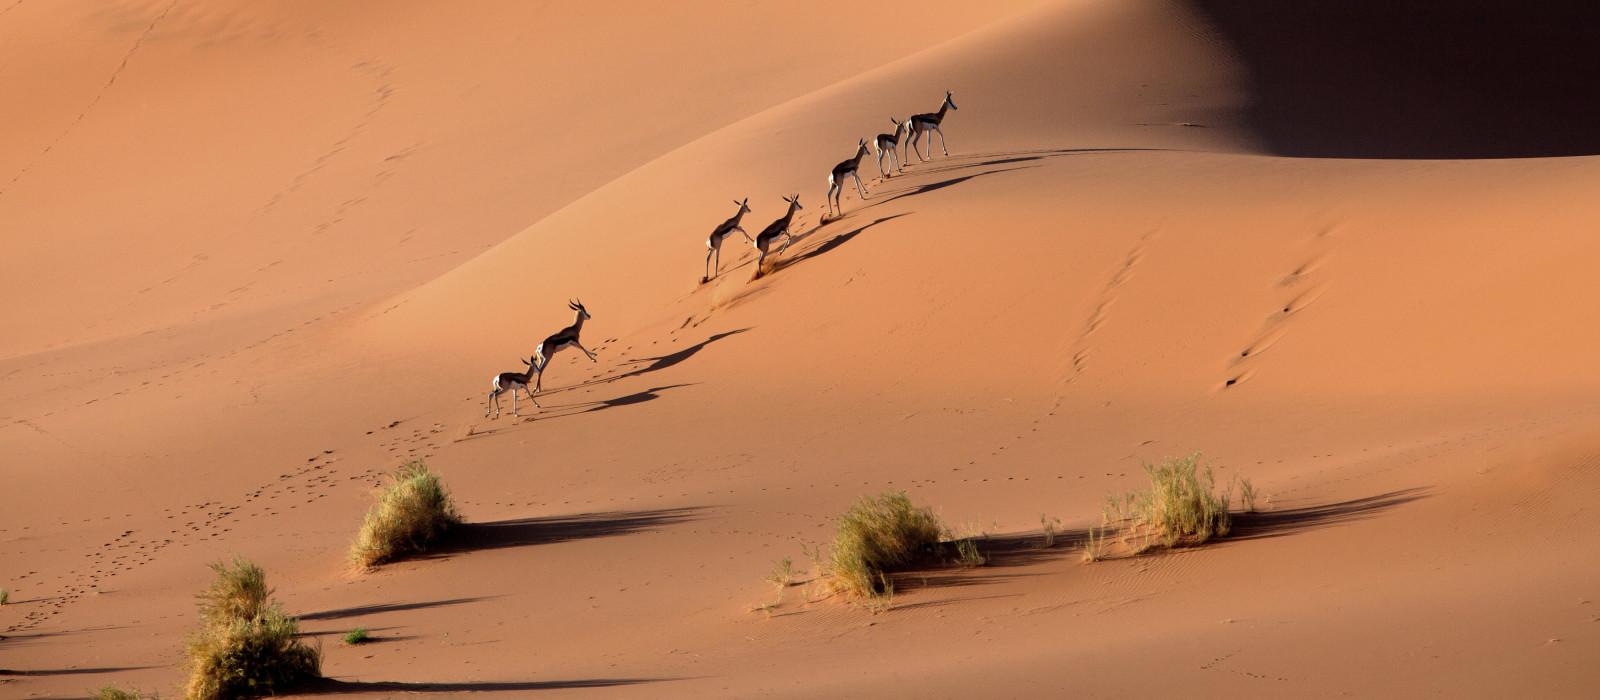 Enchanting-Travels-Africa-Namibia-1.jpg